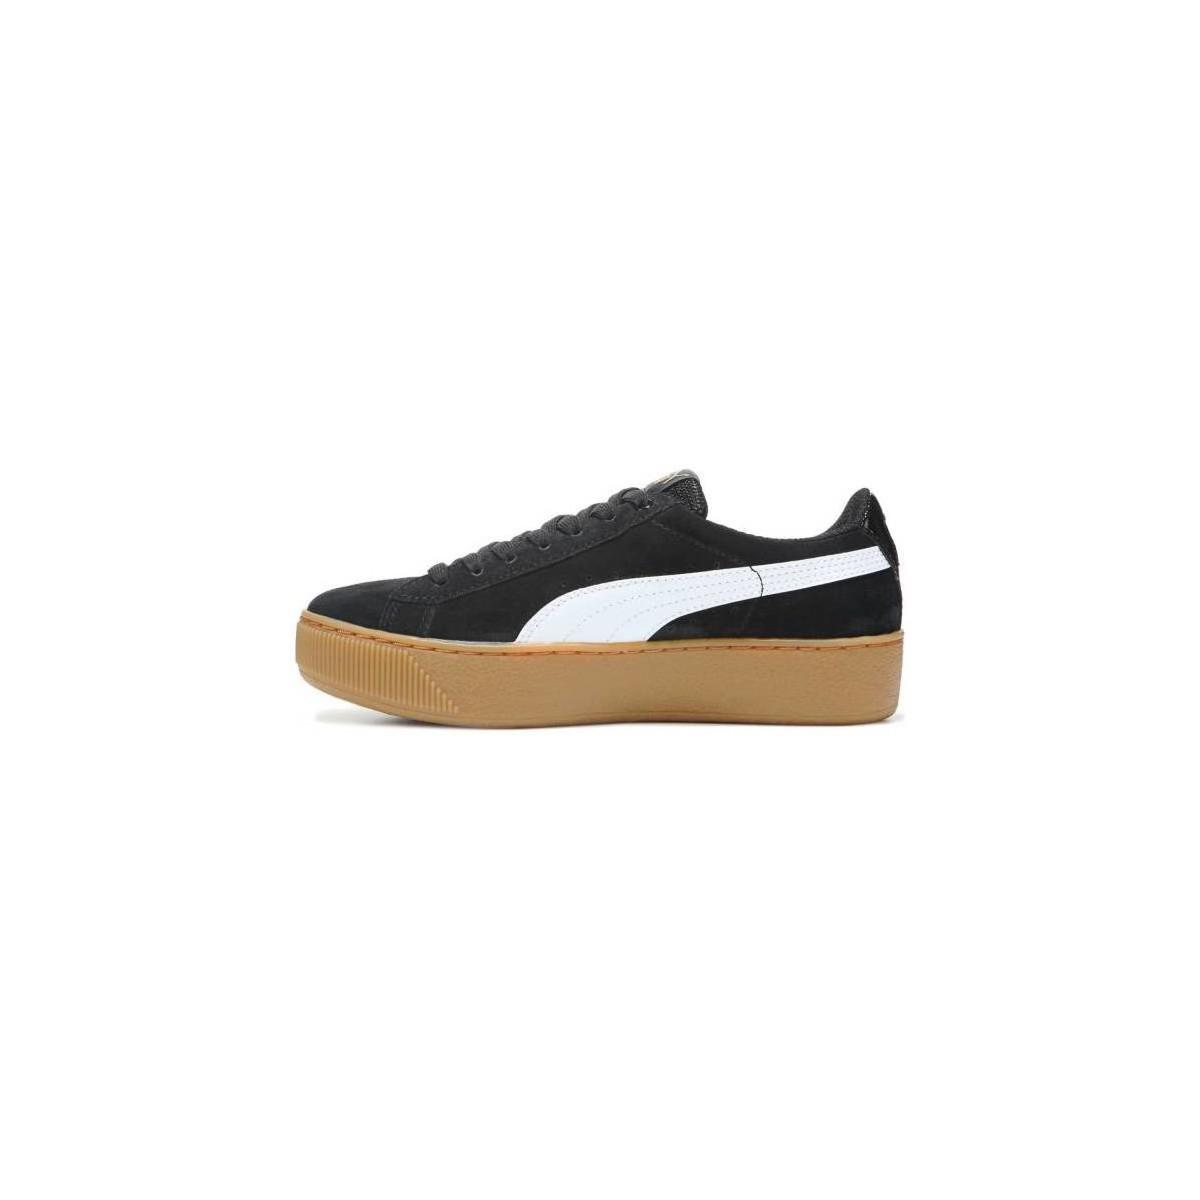 PUMA - Vikky Platform Women s Shoes (trainers) In Black - Lyst. View  fullscreen 9a27b0fde